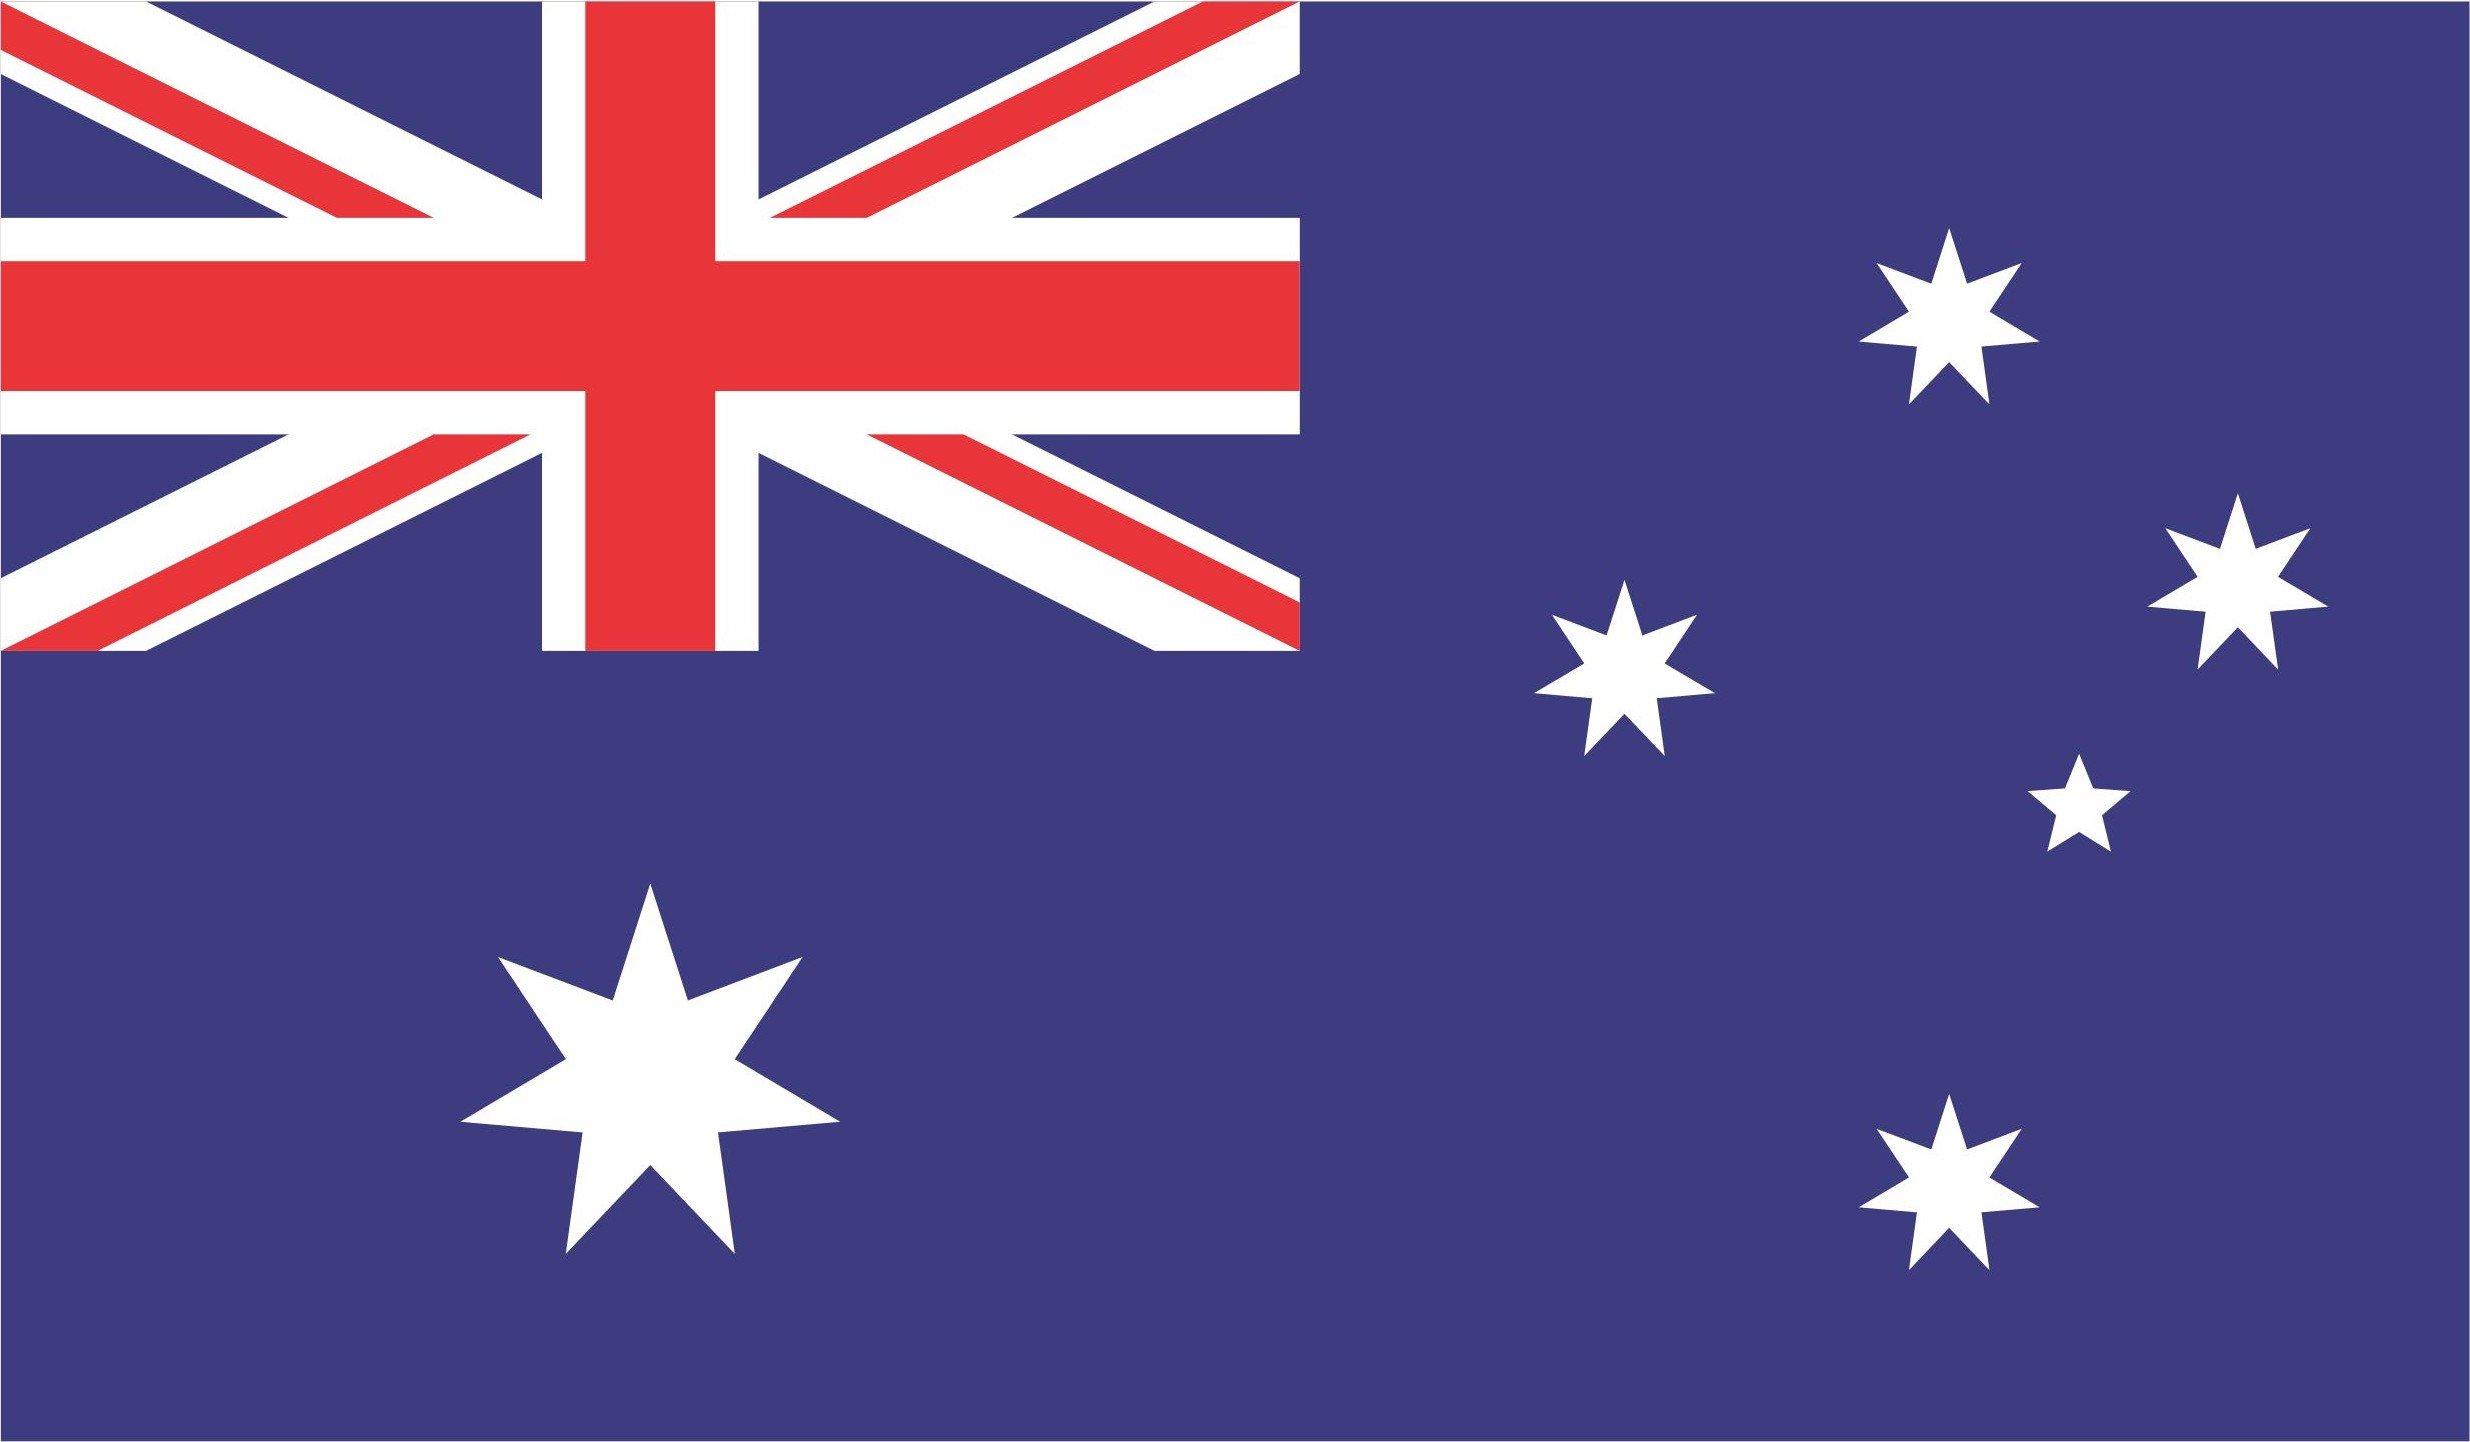 Australian Flag Vector EPS Free Download, Logo, Icons, Brand Emblems